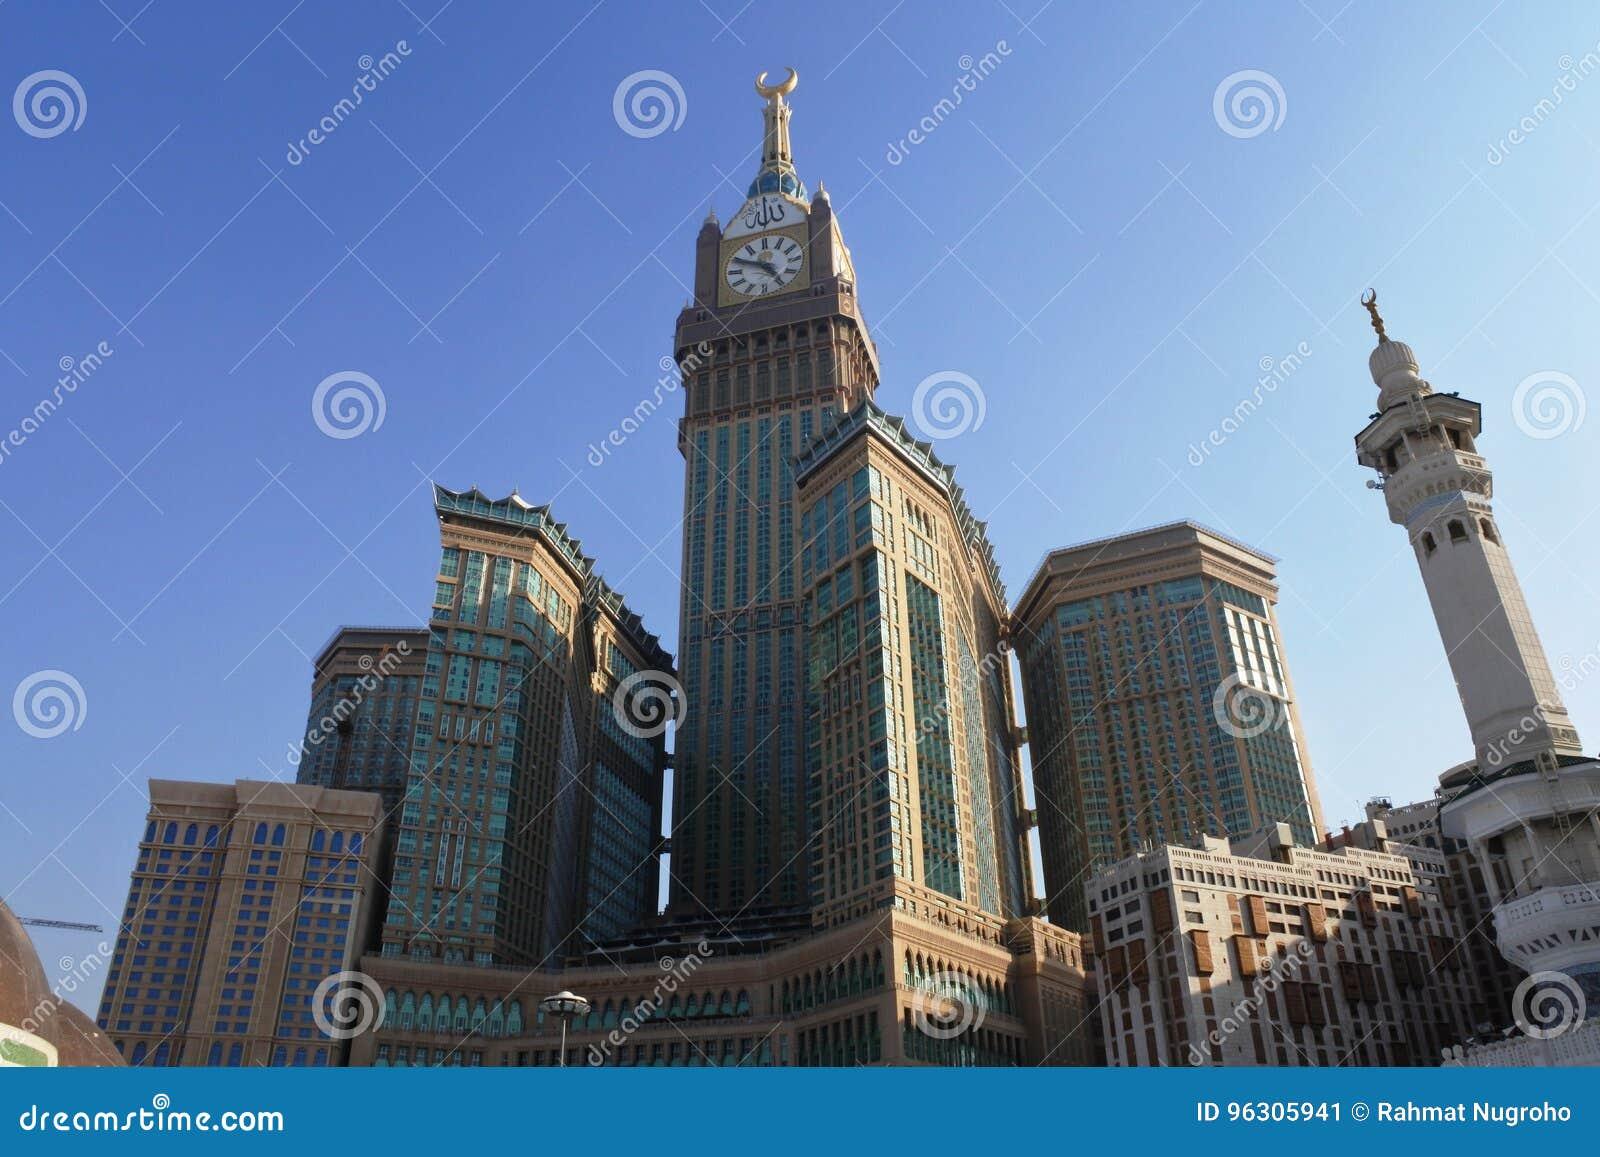 Mecca Royal Hotel Clock Tower